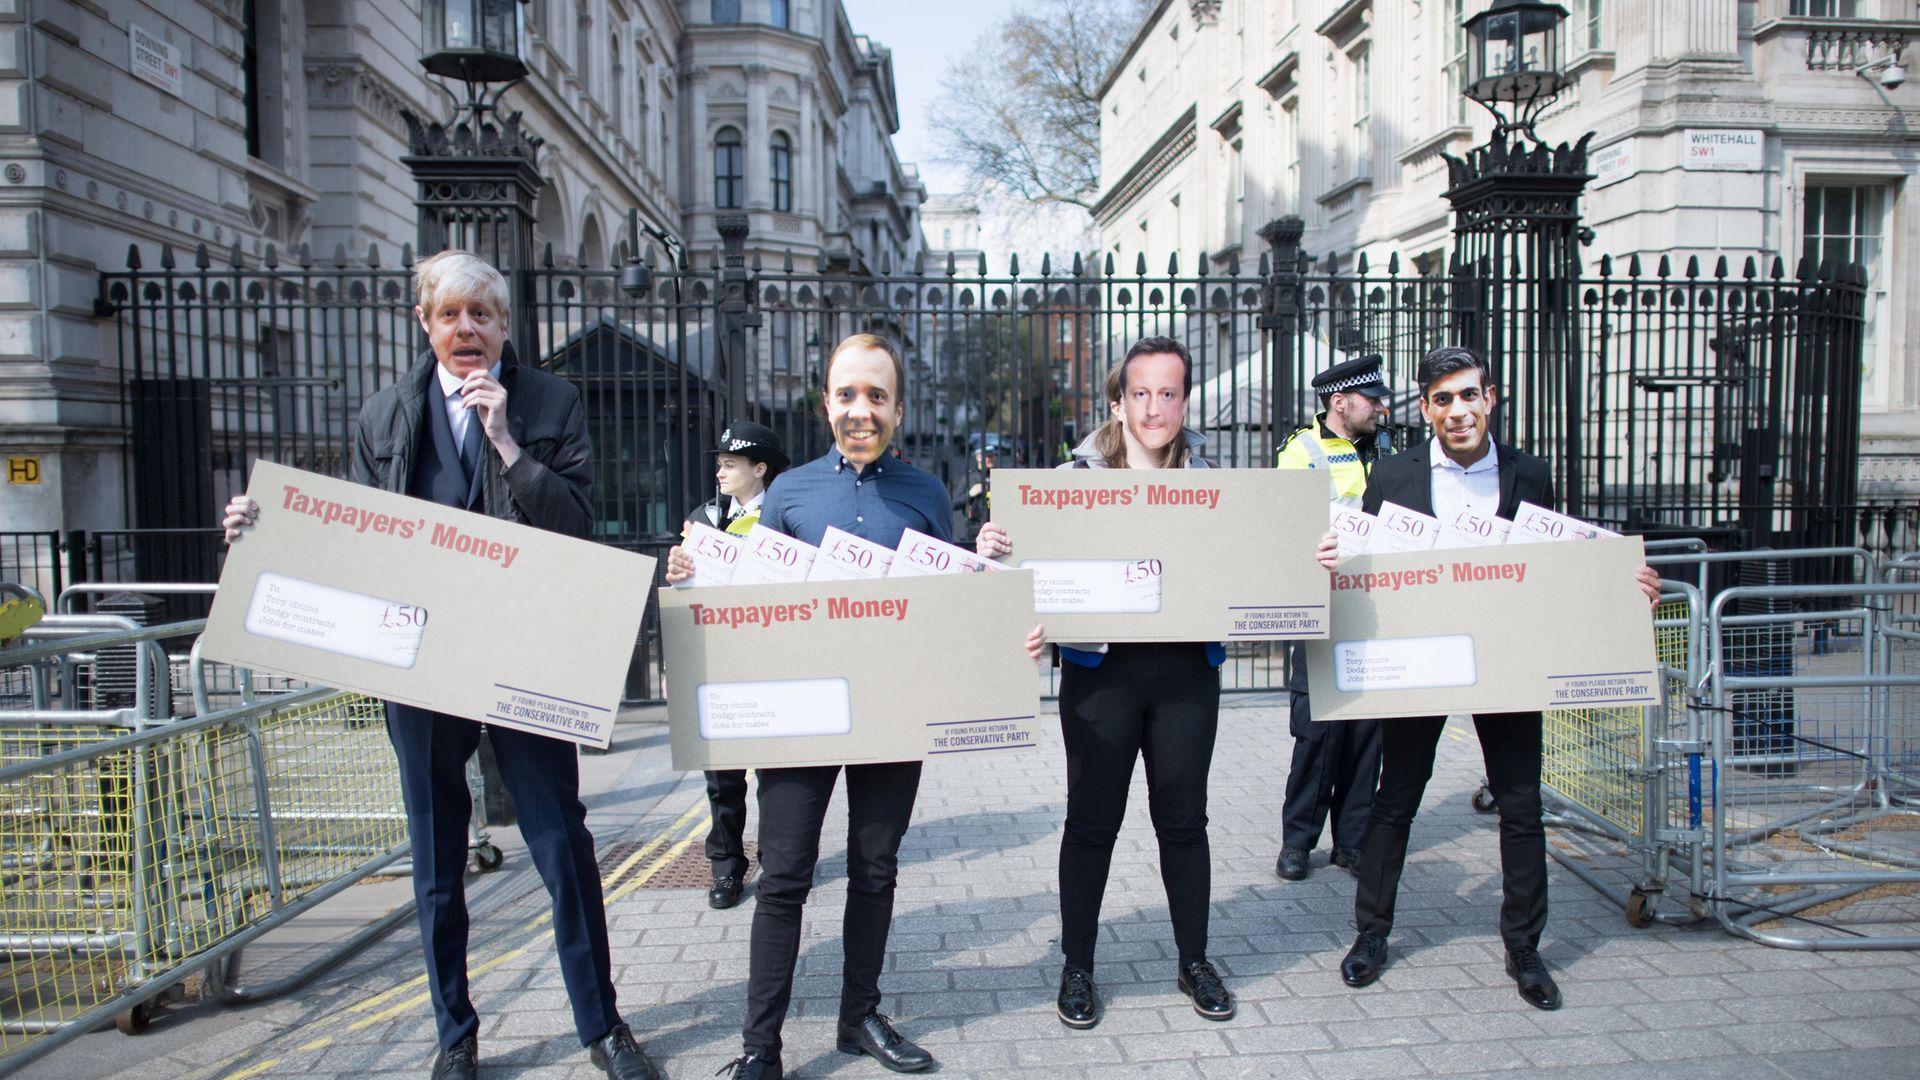 Labour activists wearing face masks, depicting prime minister Boris Johnson, chancellor Rishi Sunak, health secretary Matt Hancock and former PM David Cameron - Credit: PA